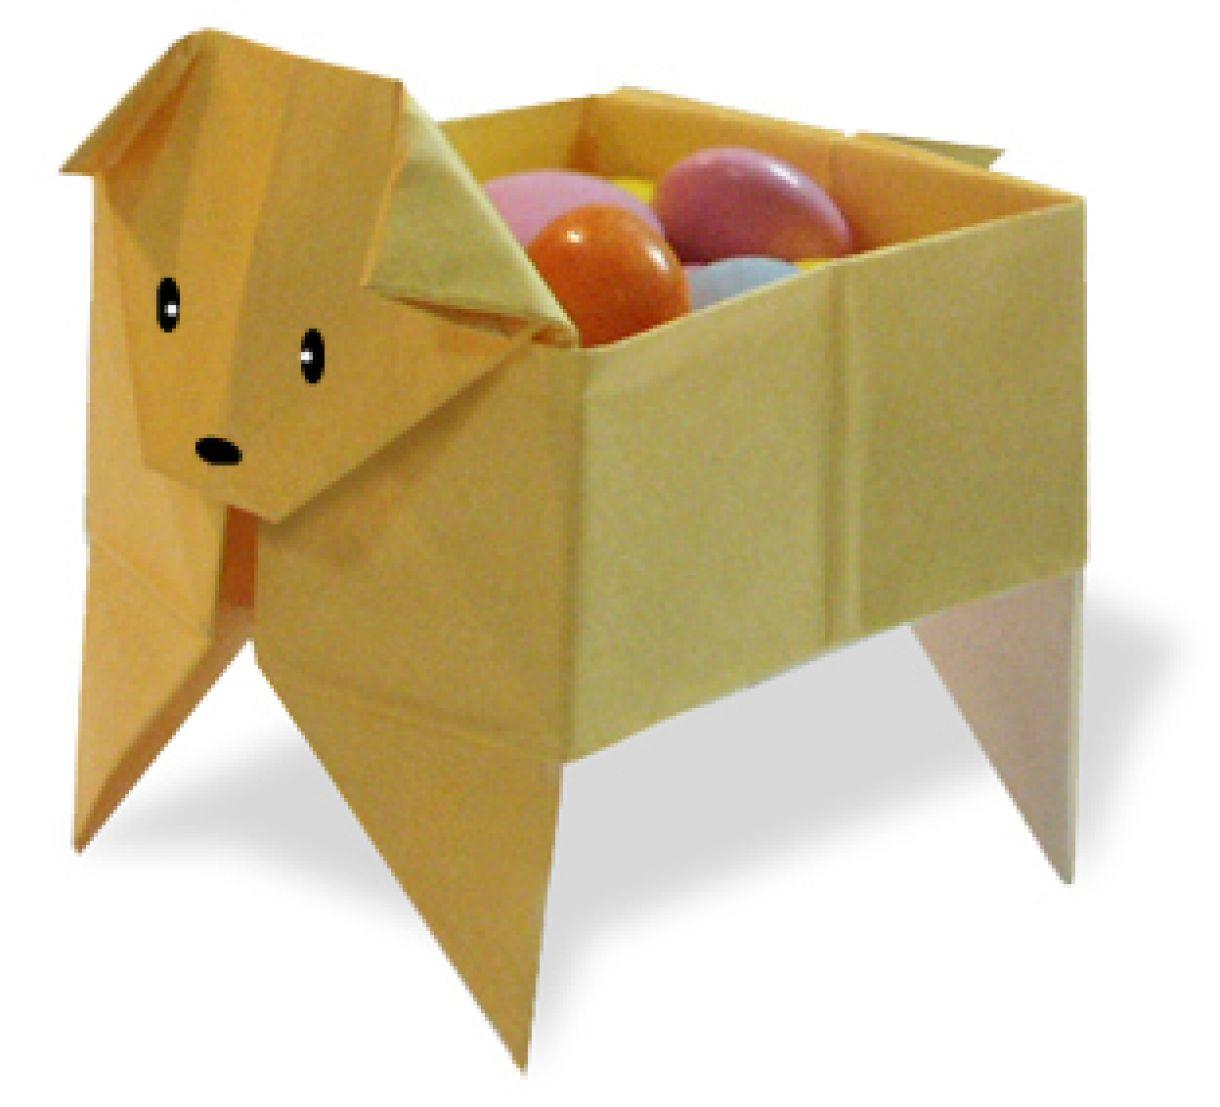 Origami Gift Box Shaped Like A Dog